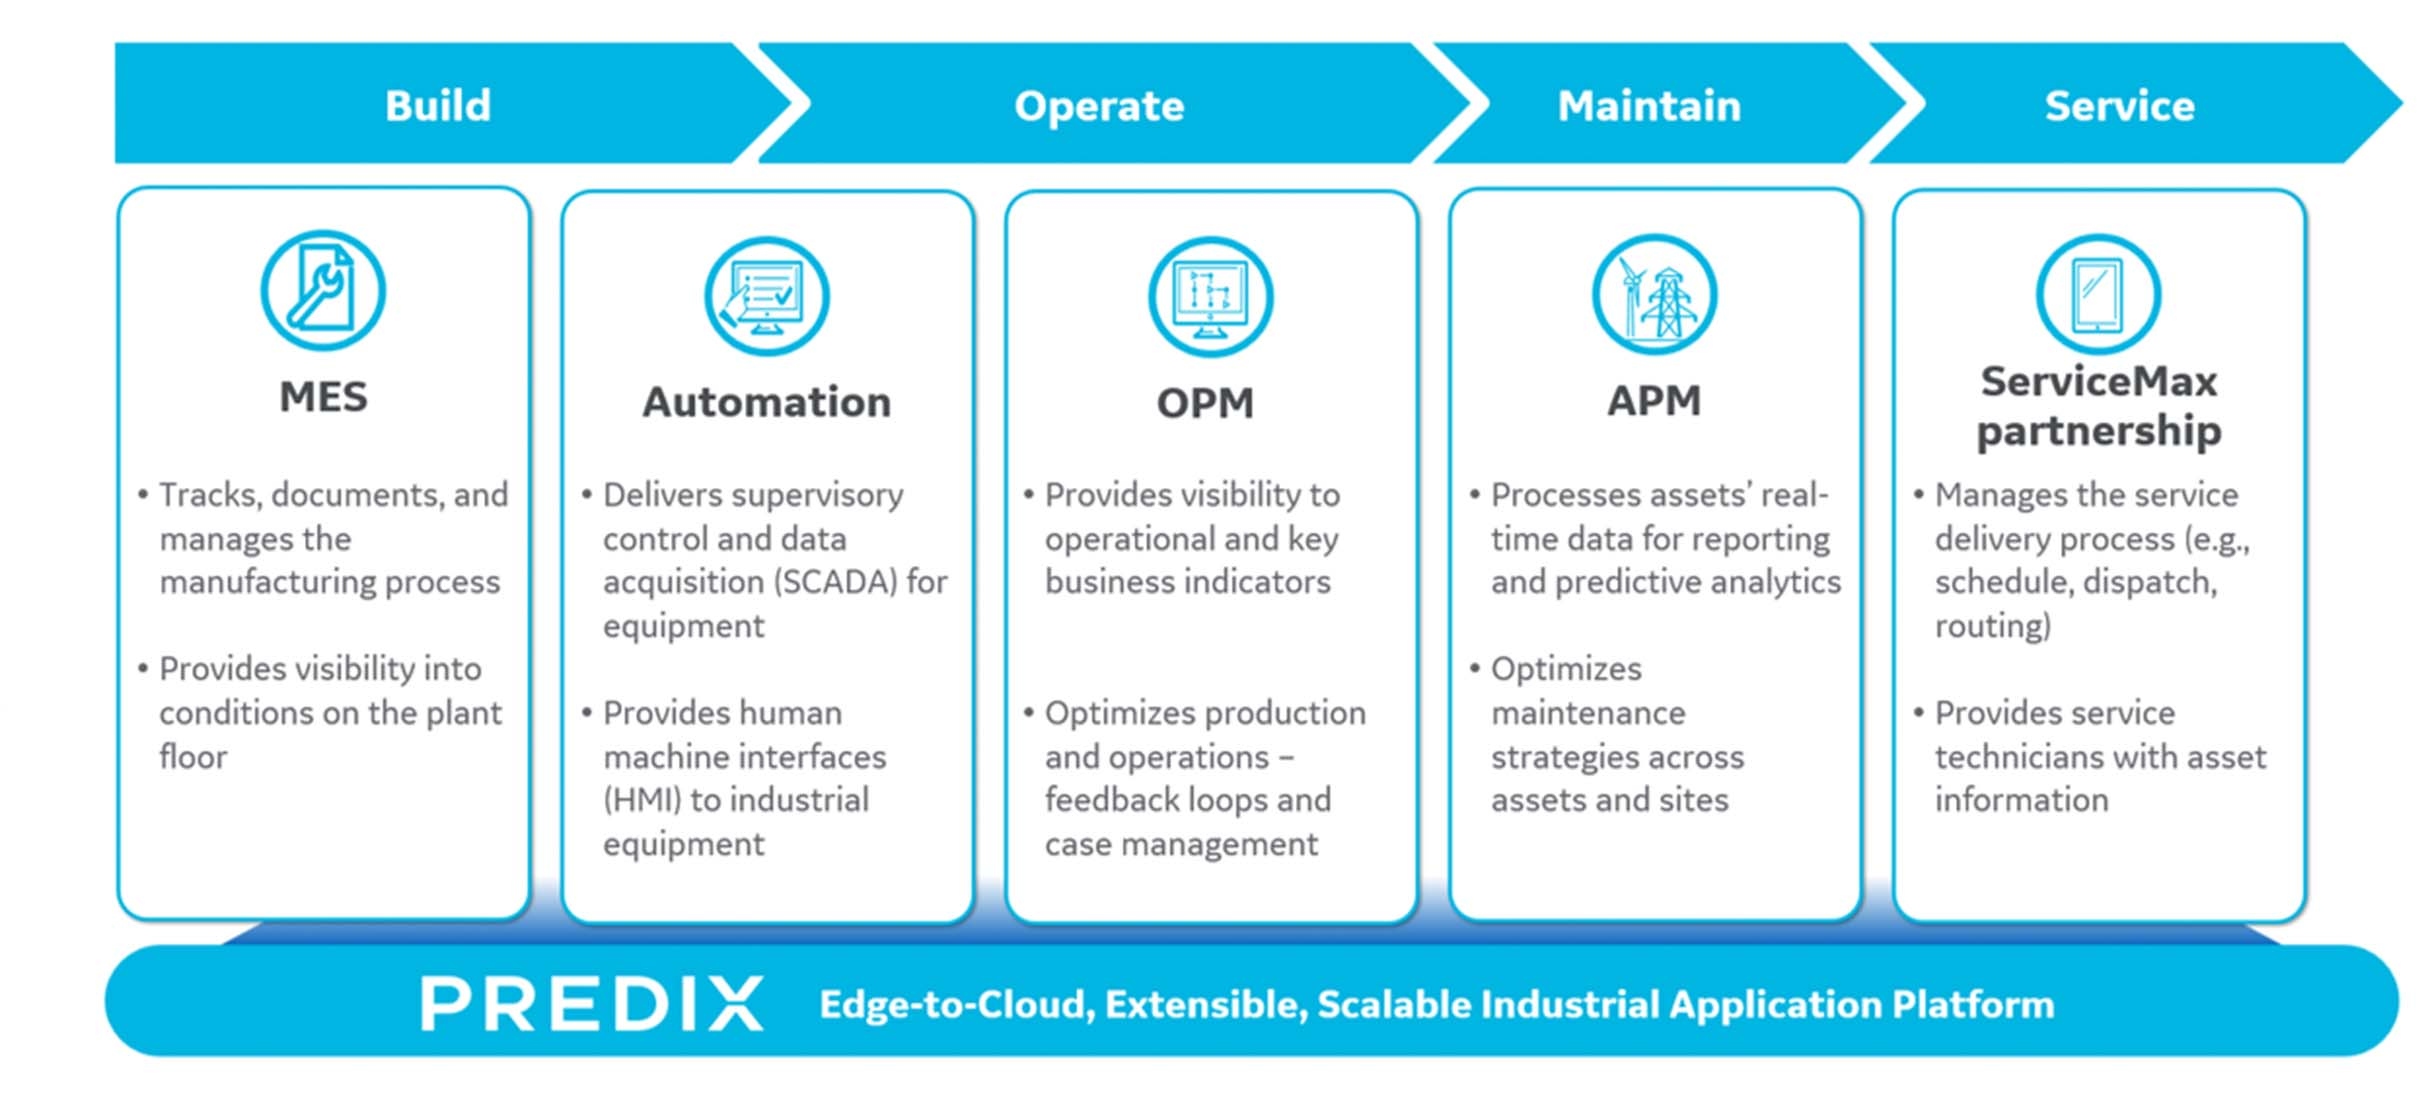 GE Digital Industrial App Portfolio Overview